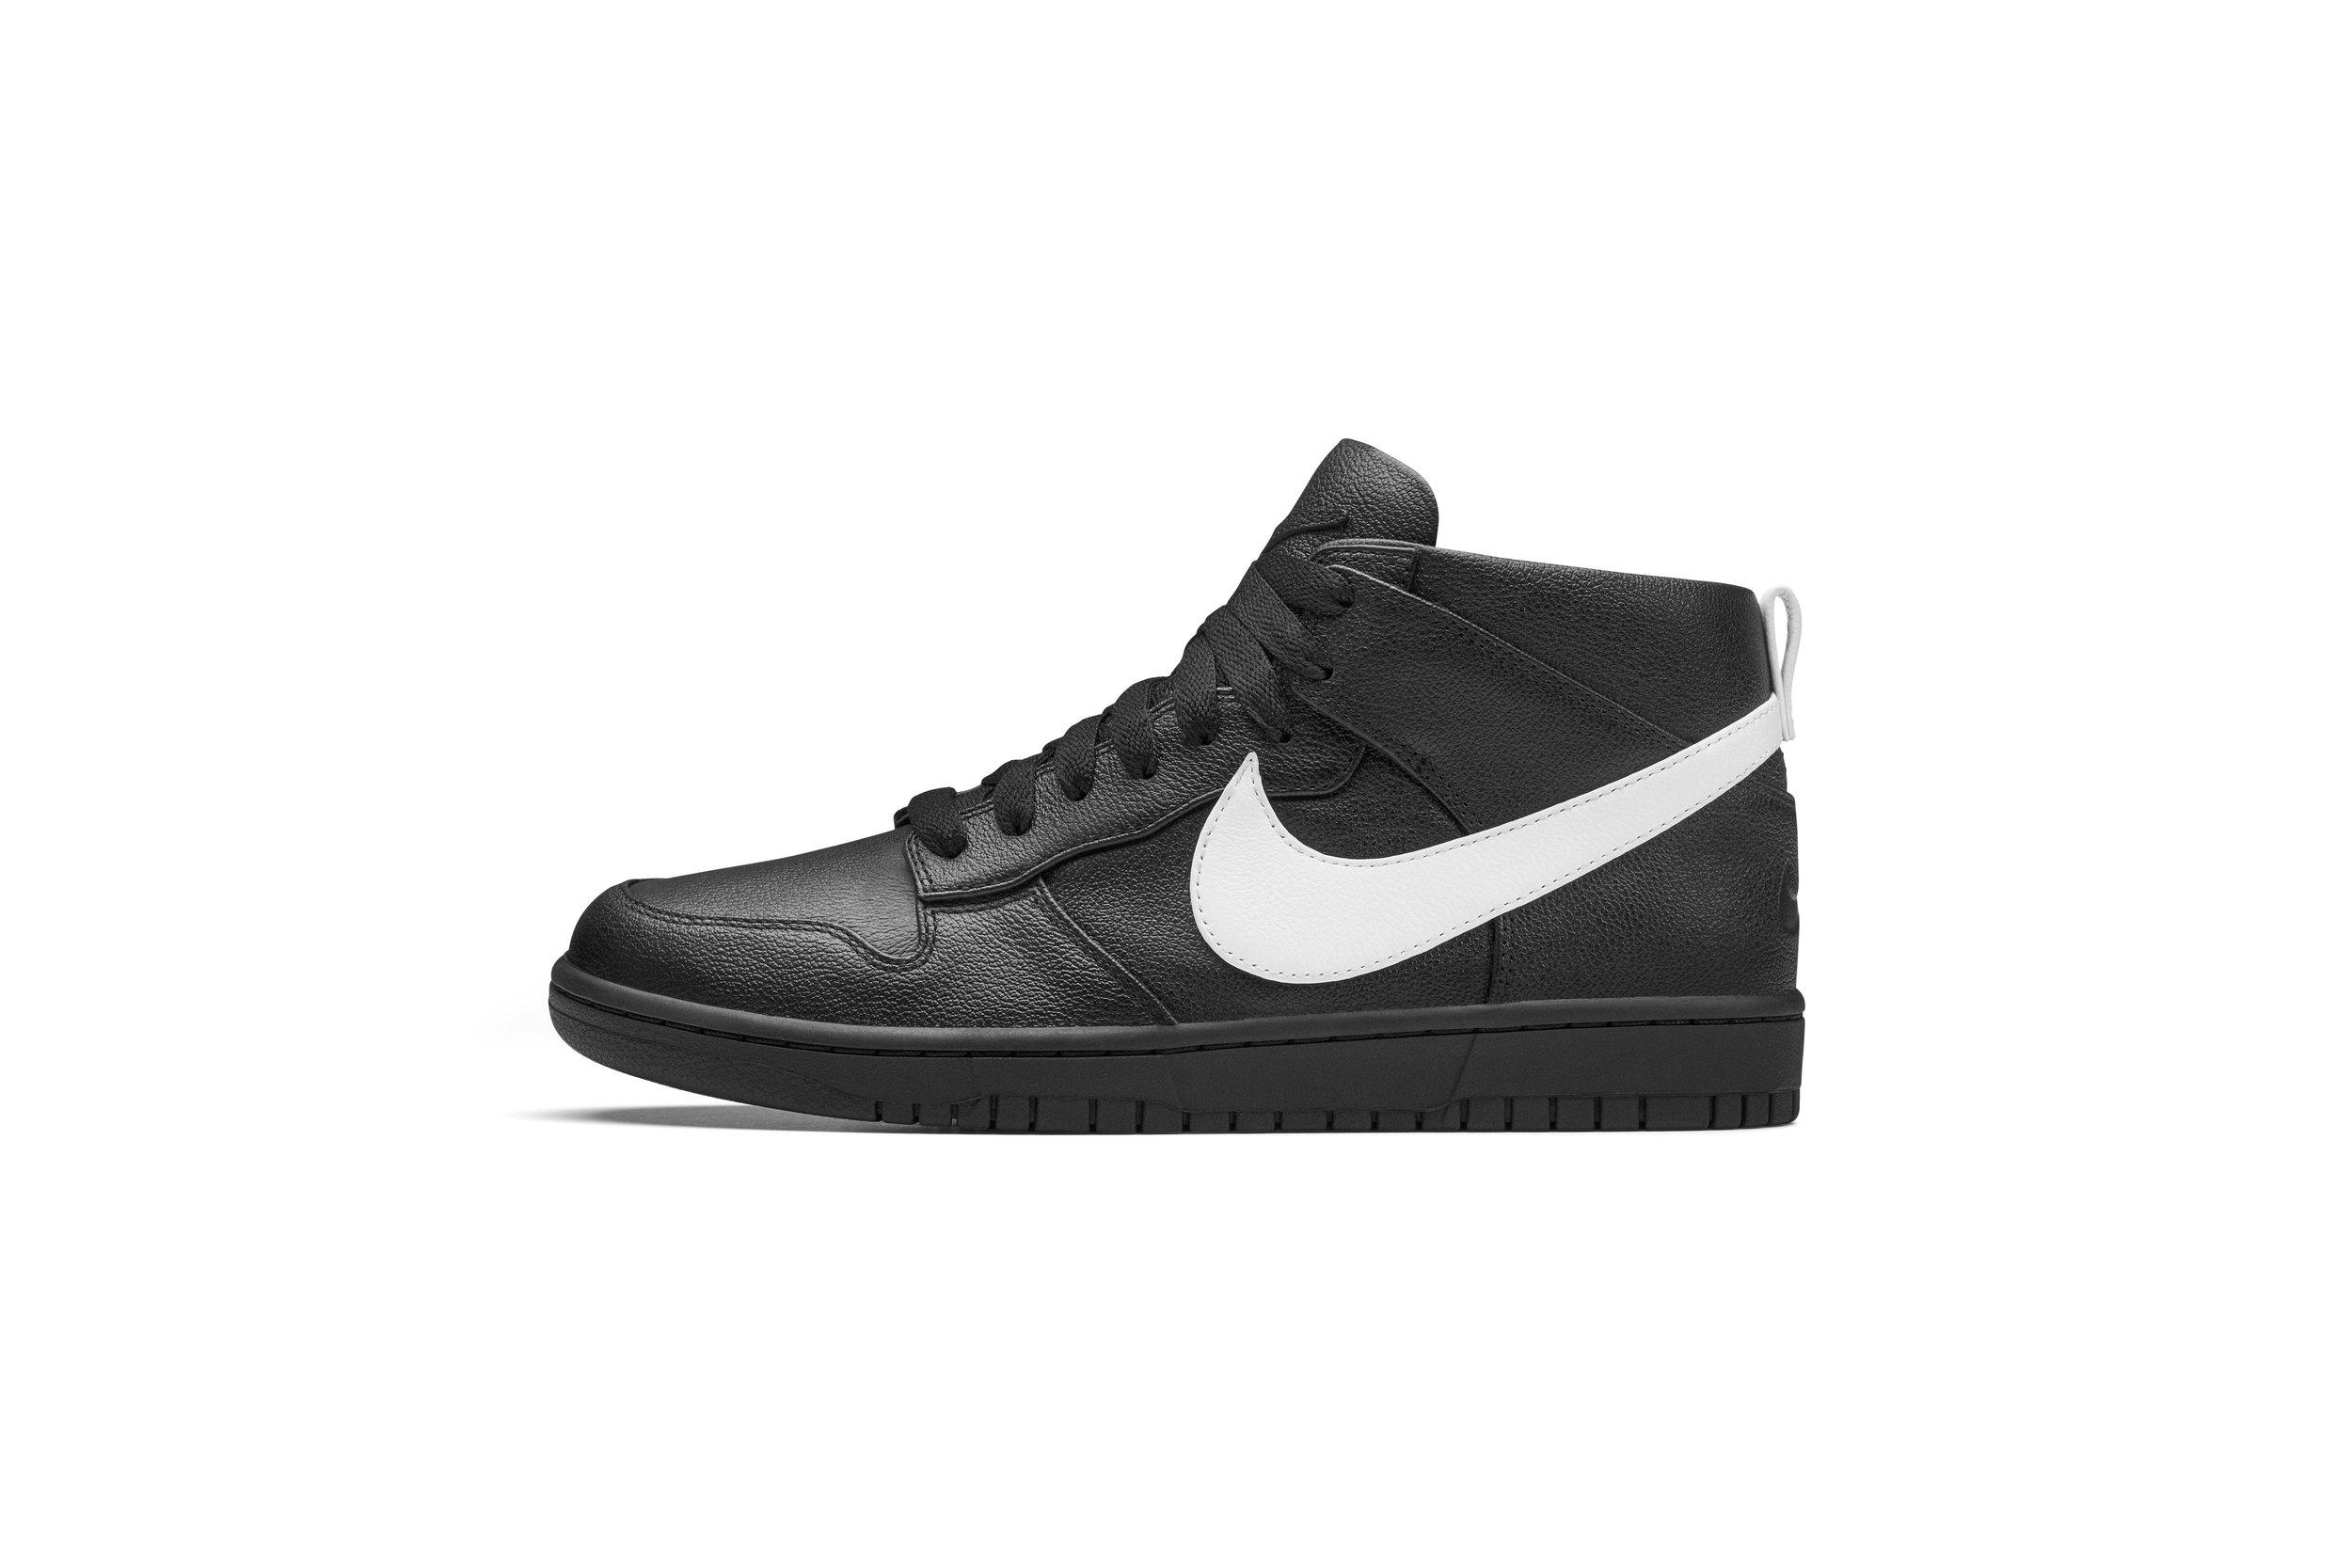 NikeLab_Dunk_Lux_Chukka_RT_2_65805.jpg